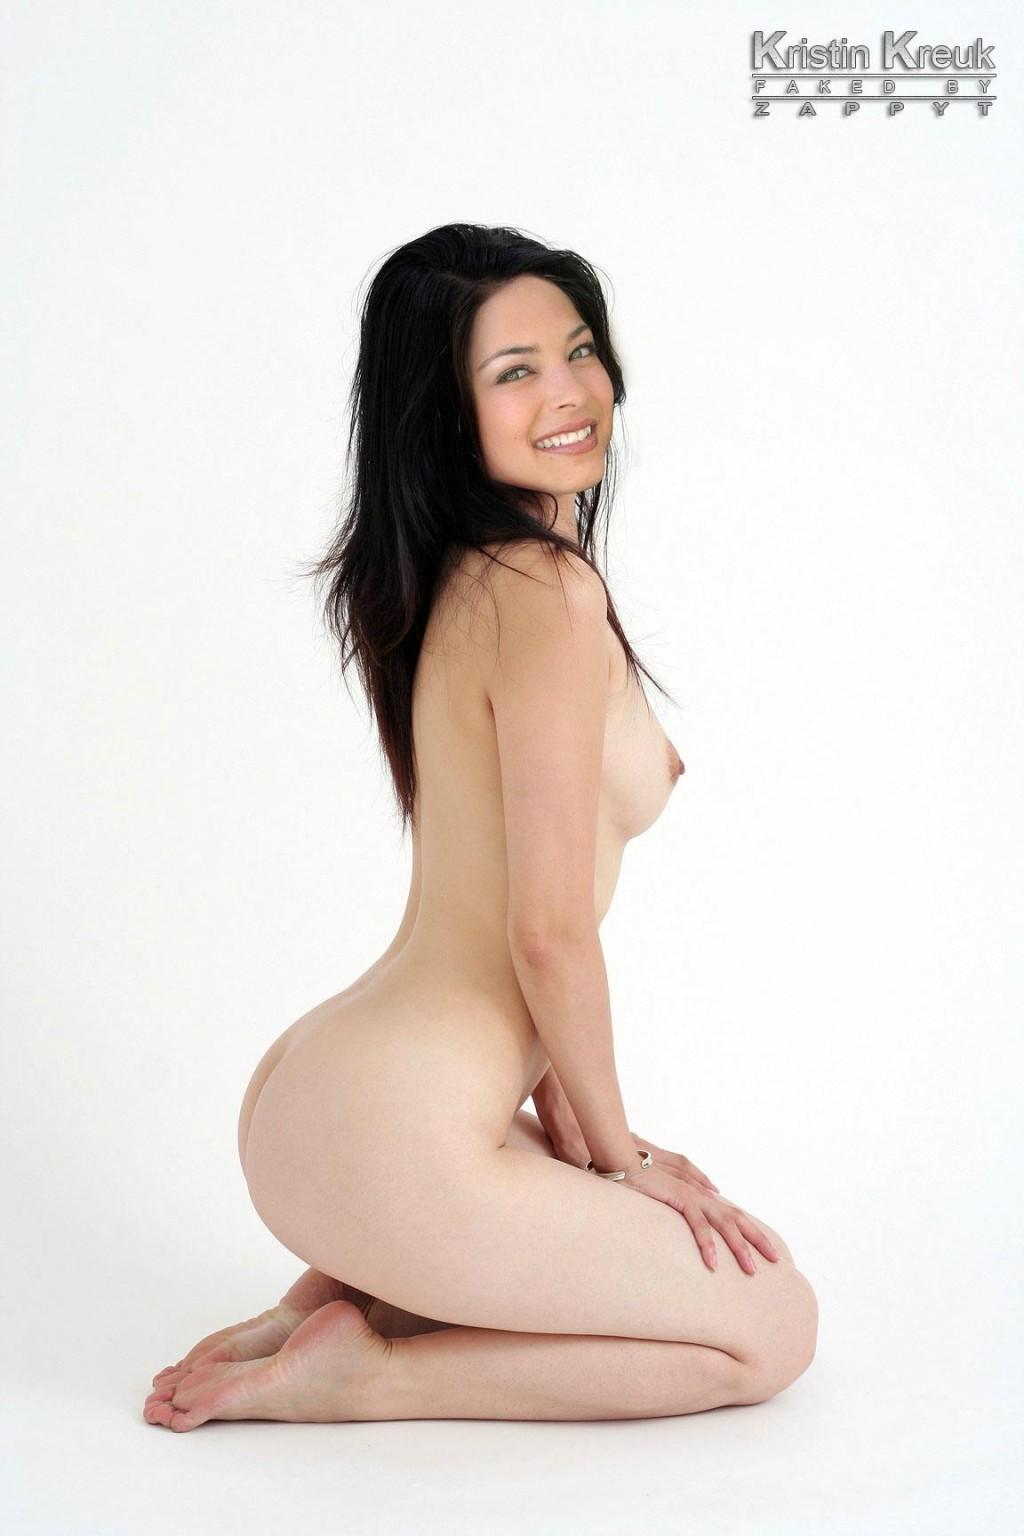 Not Kristen kreuk fake sex join